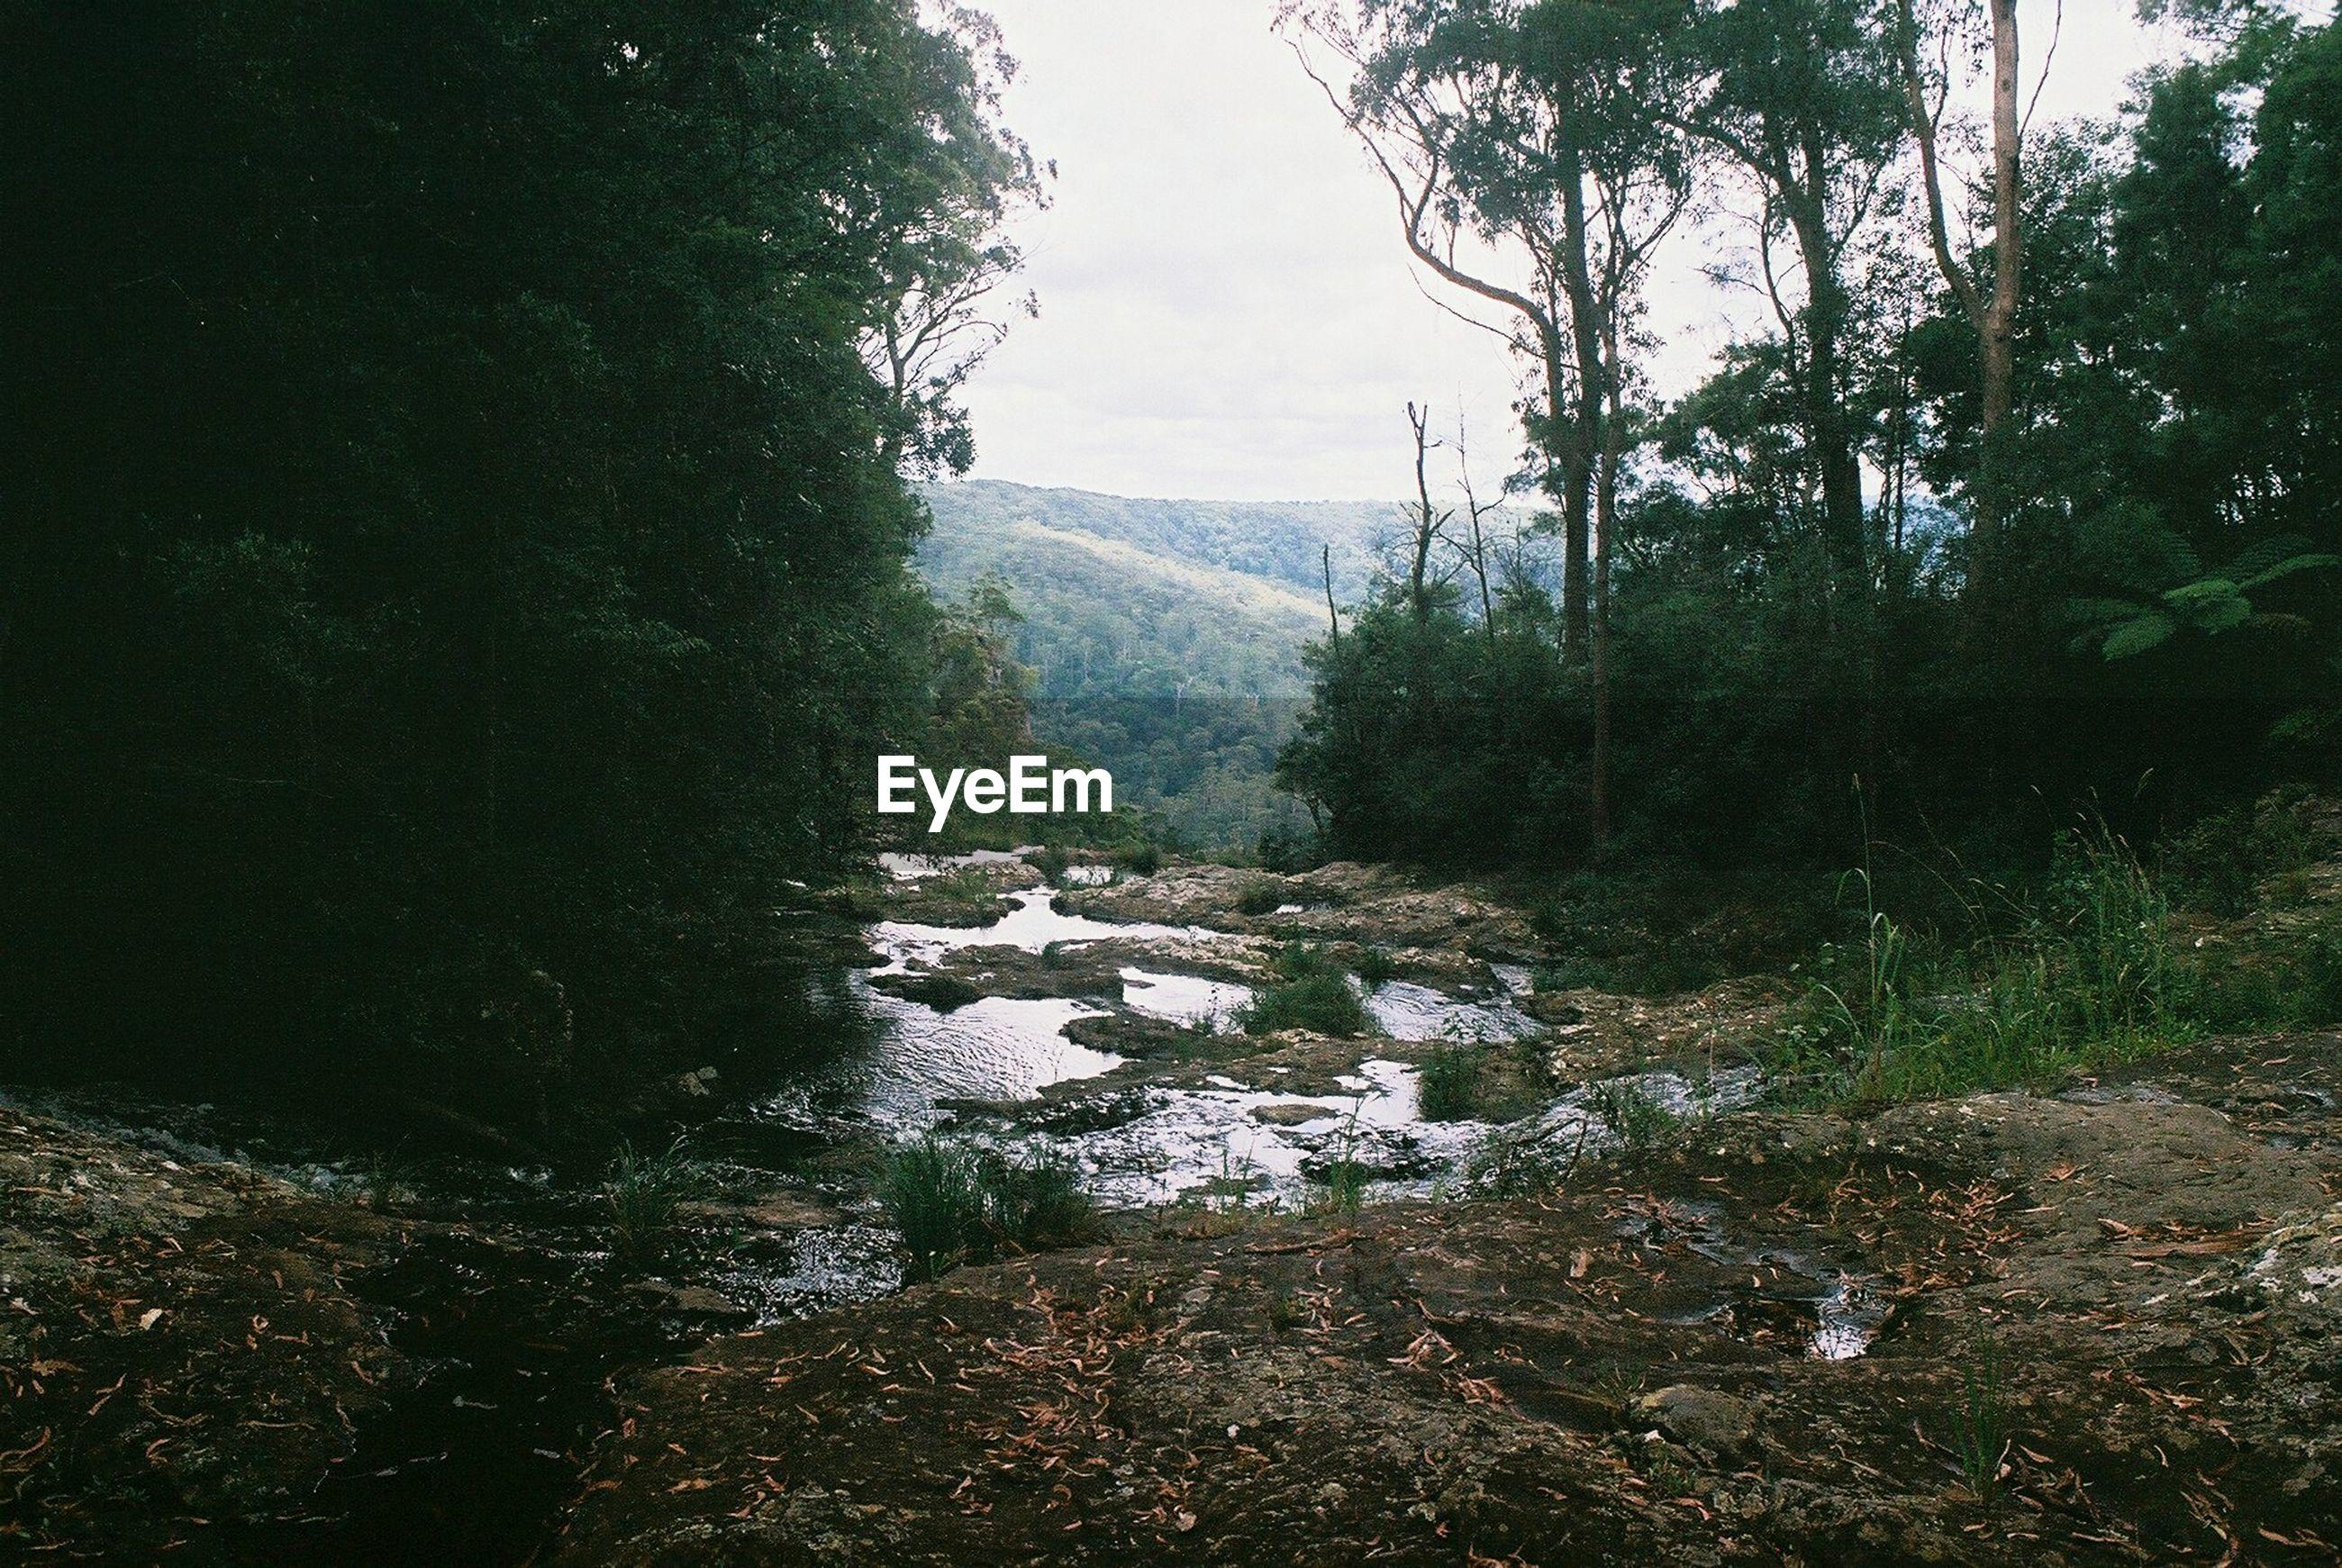 Stream amidst trees on mountain